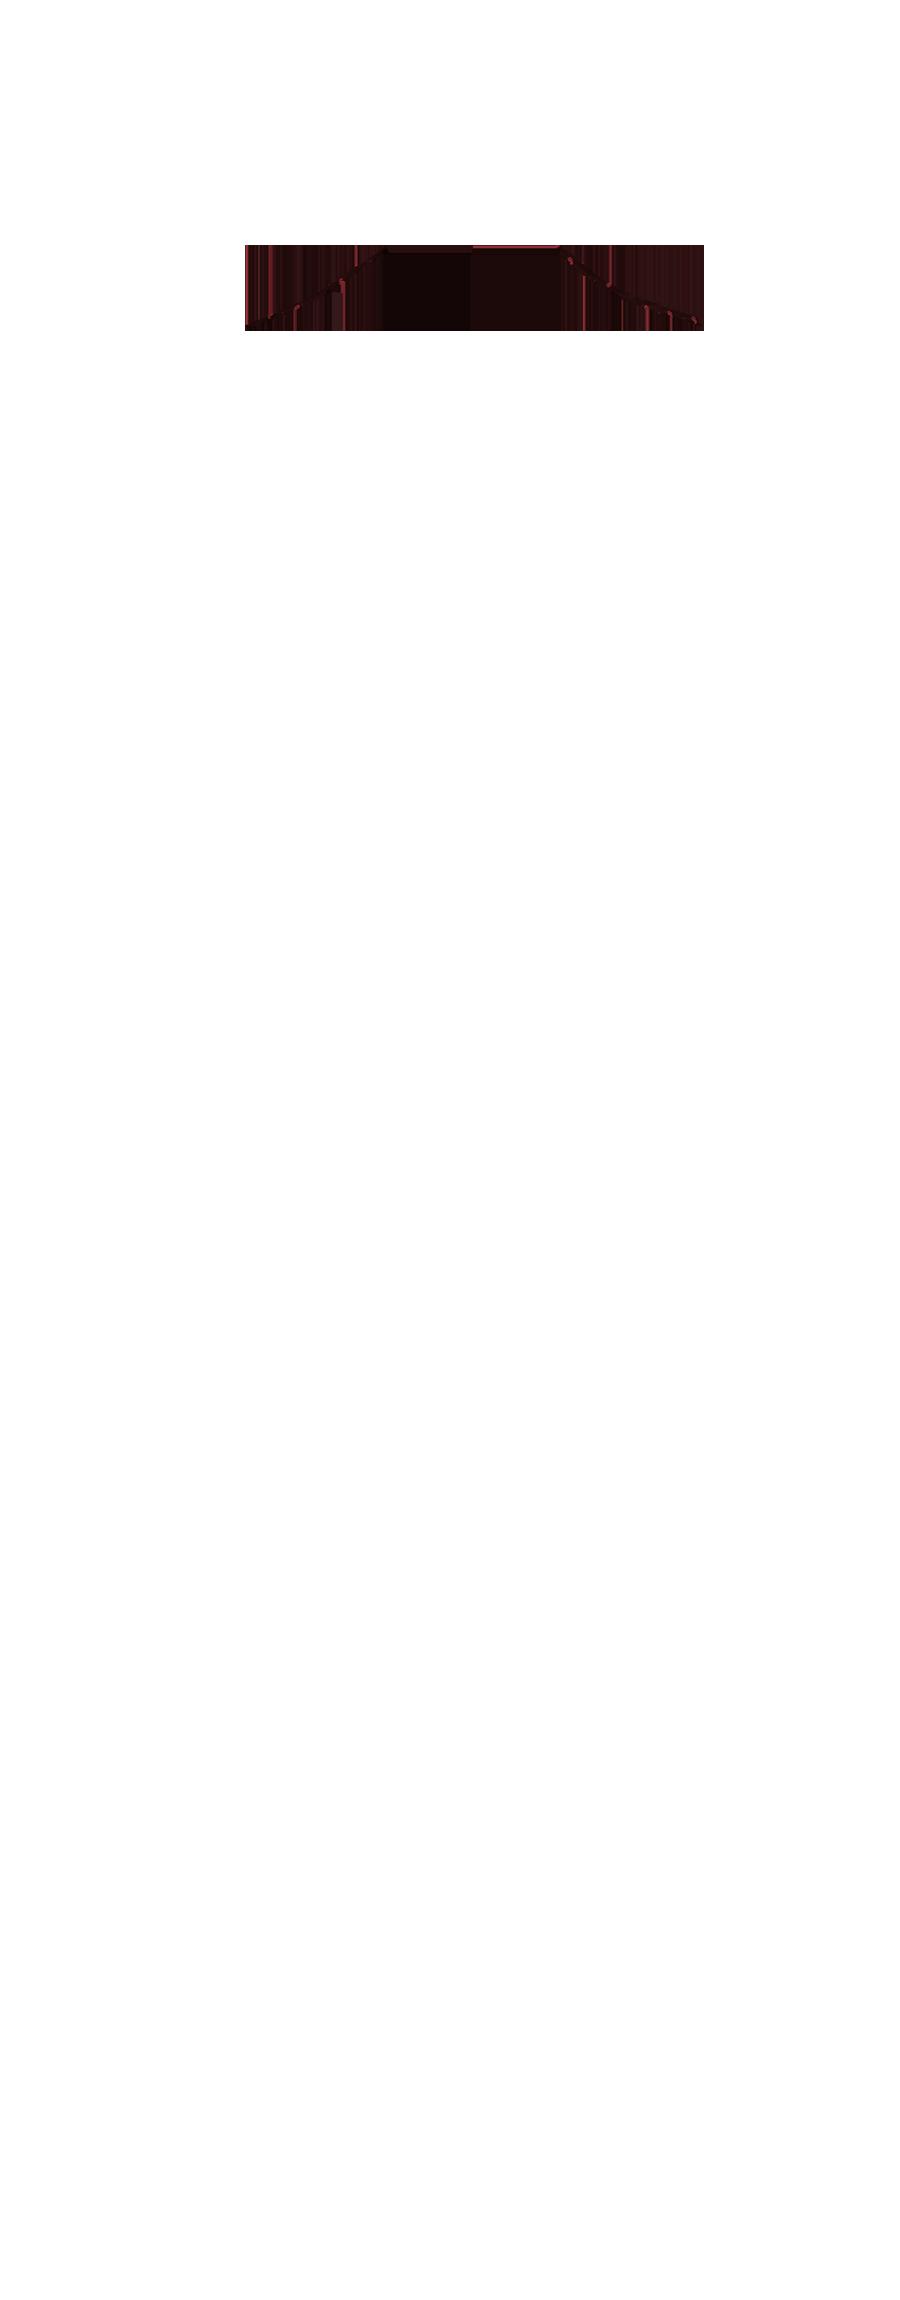 NEFL-15